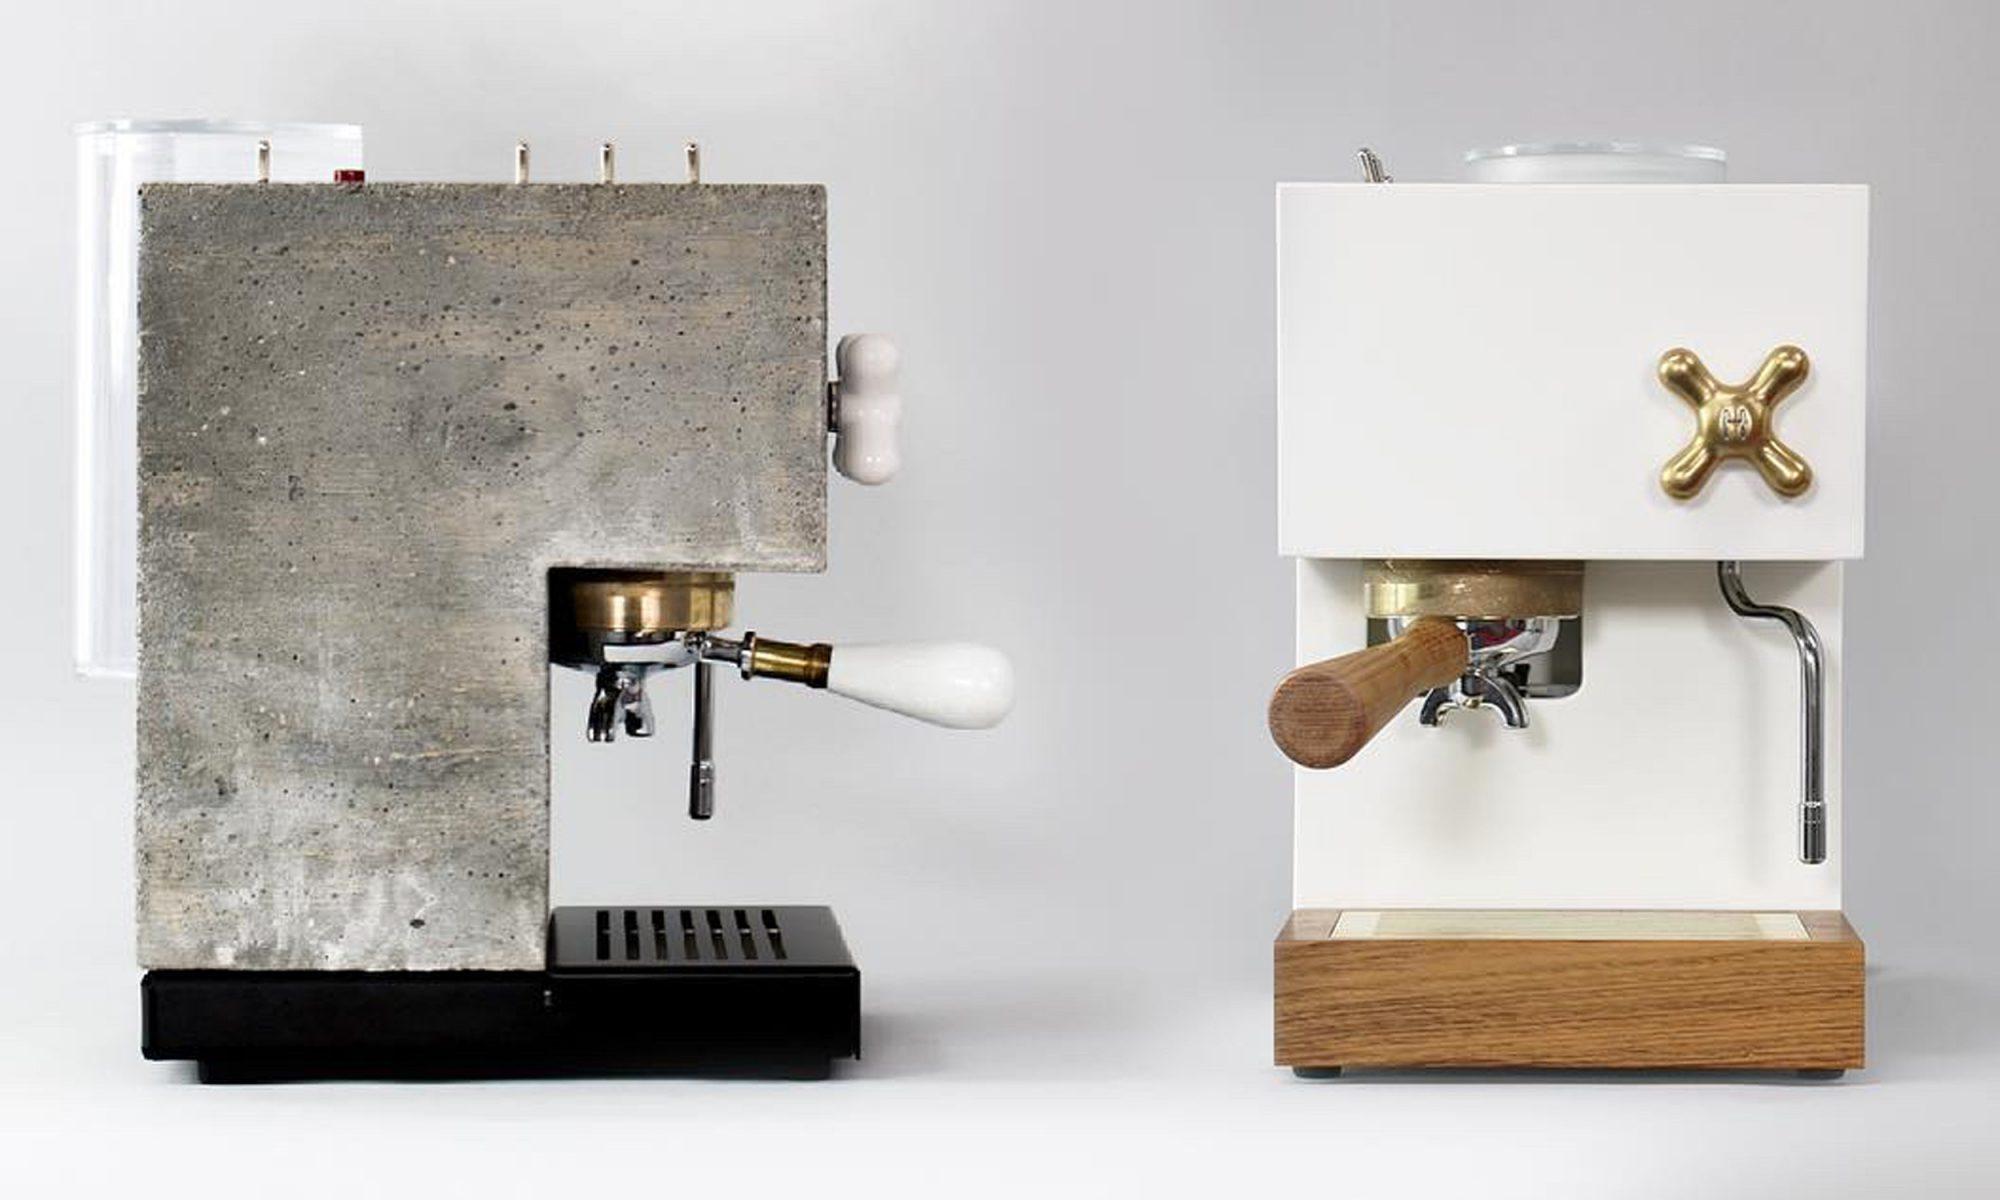 anza brutalist coffee maker